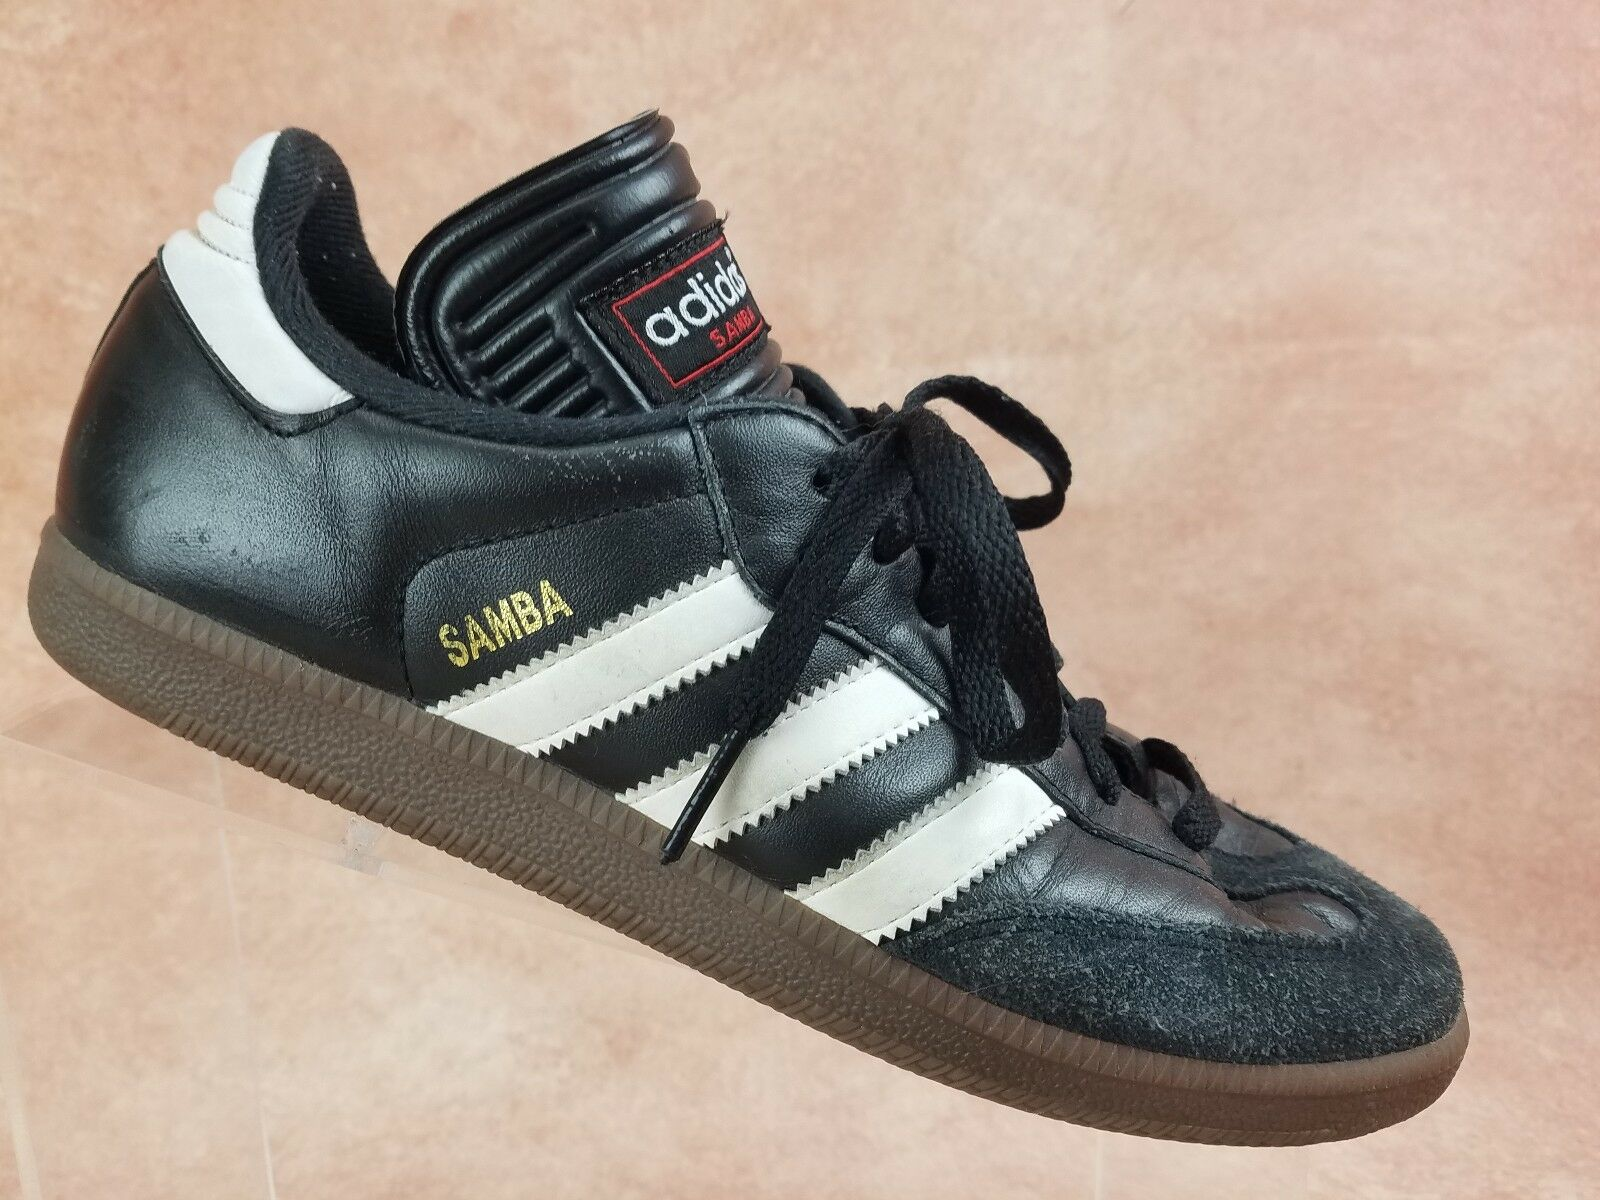 Adidas Samba Soccer Shoe Comfortable Cheap and beautiful fashion